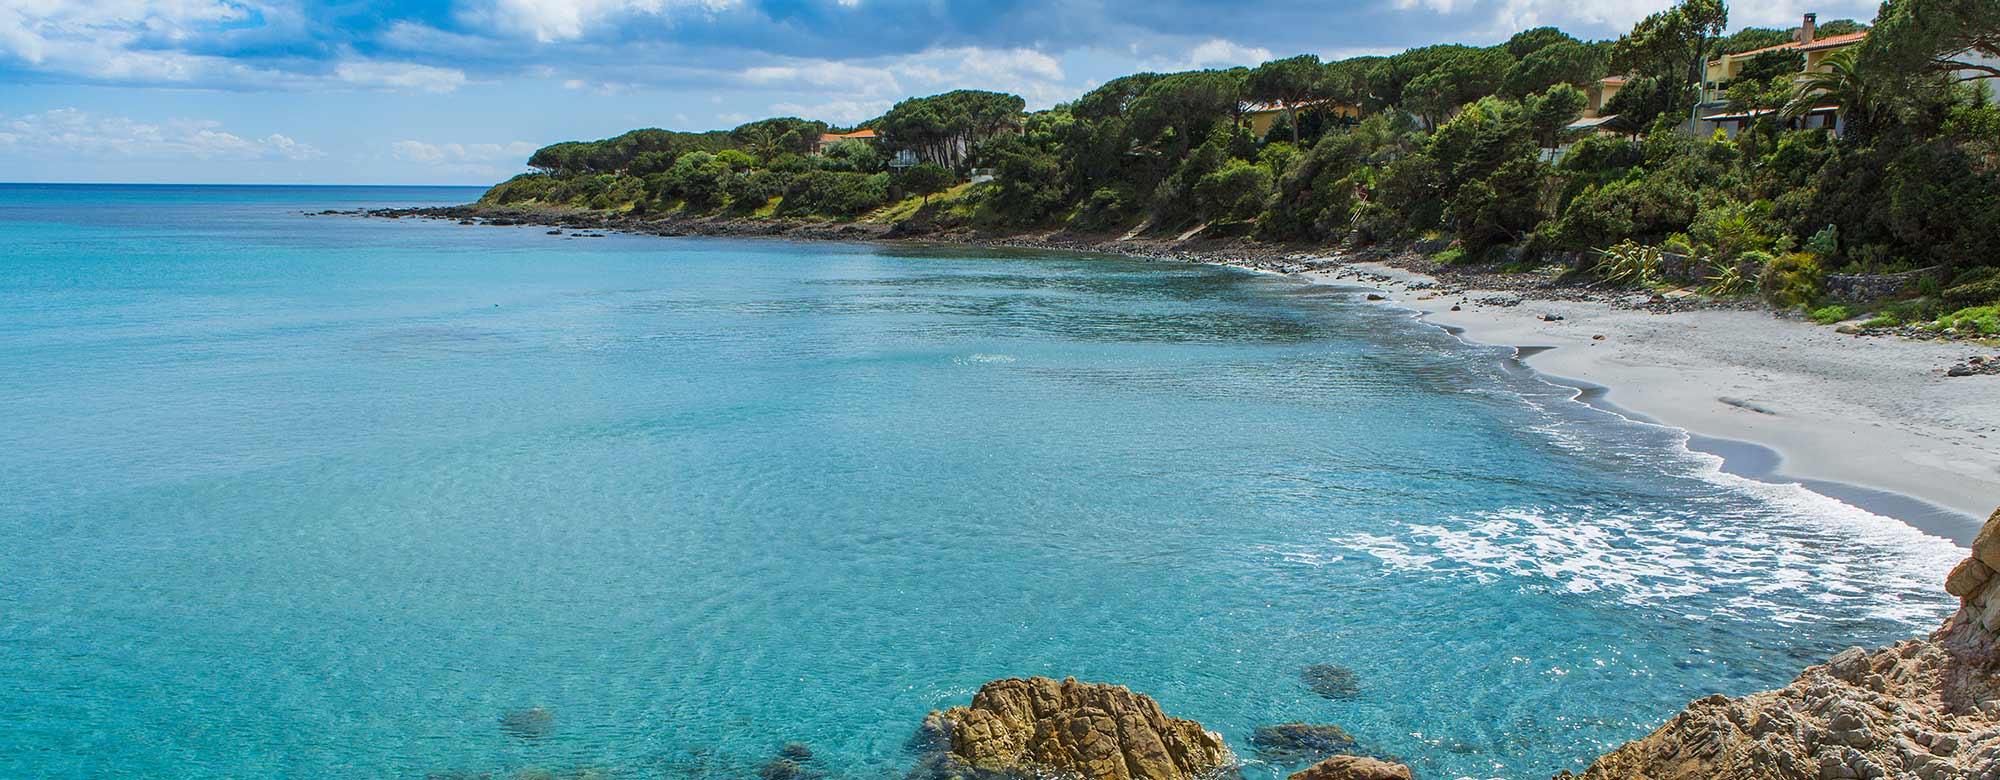 Cala Liberotto – Sardinia